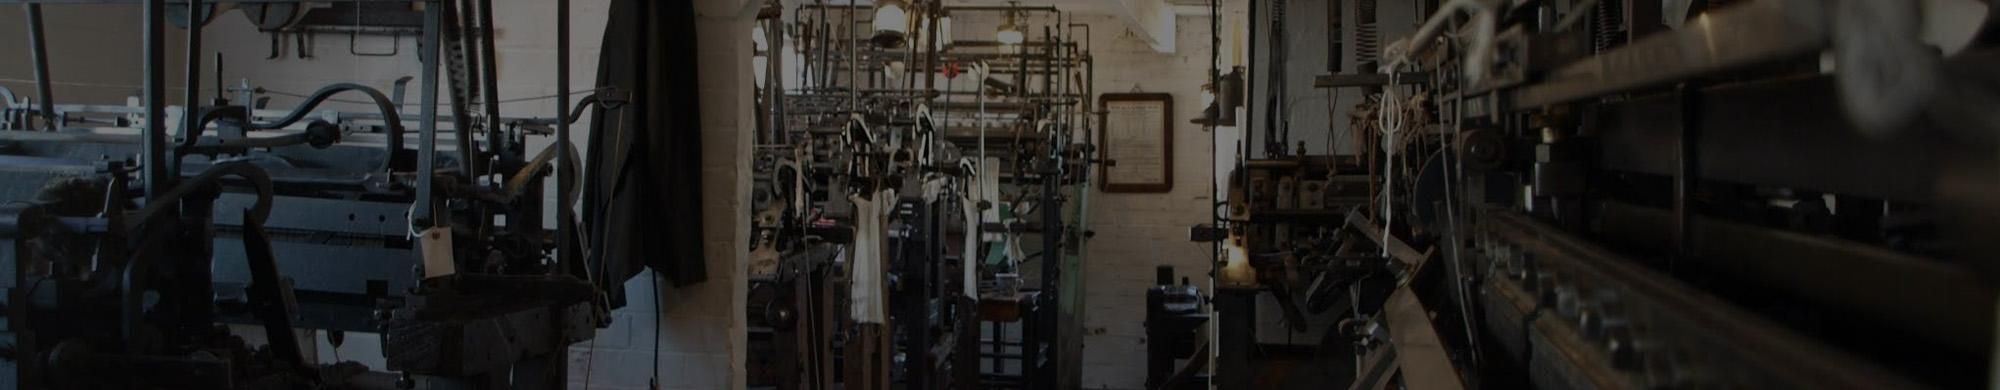 Framework Knitters Museum redevelopment survey